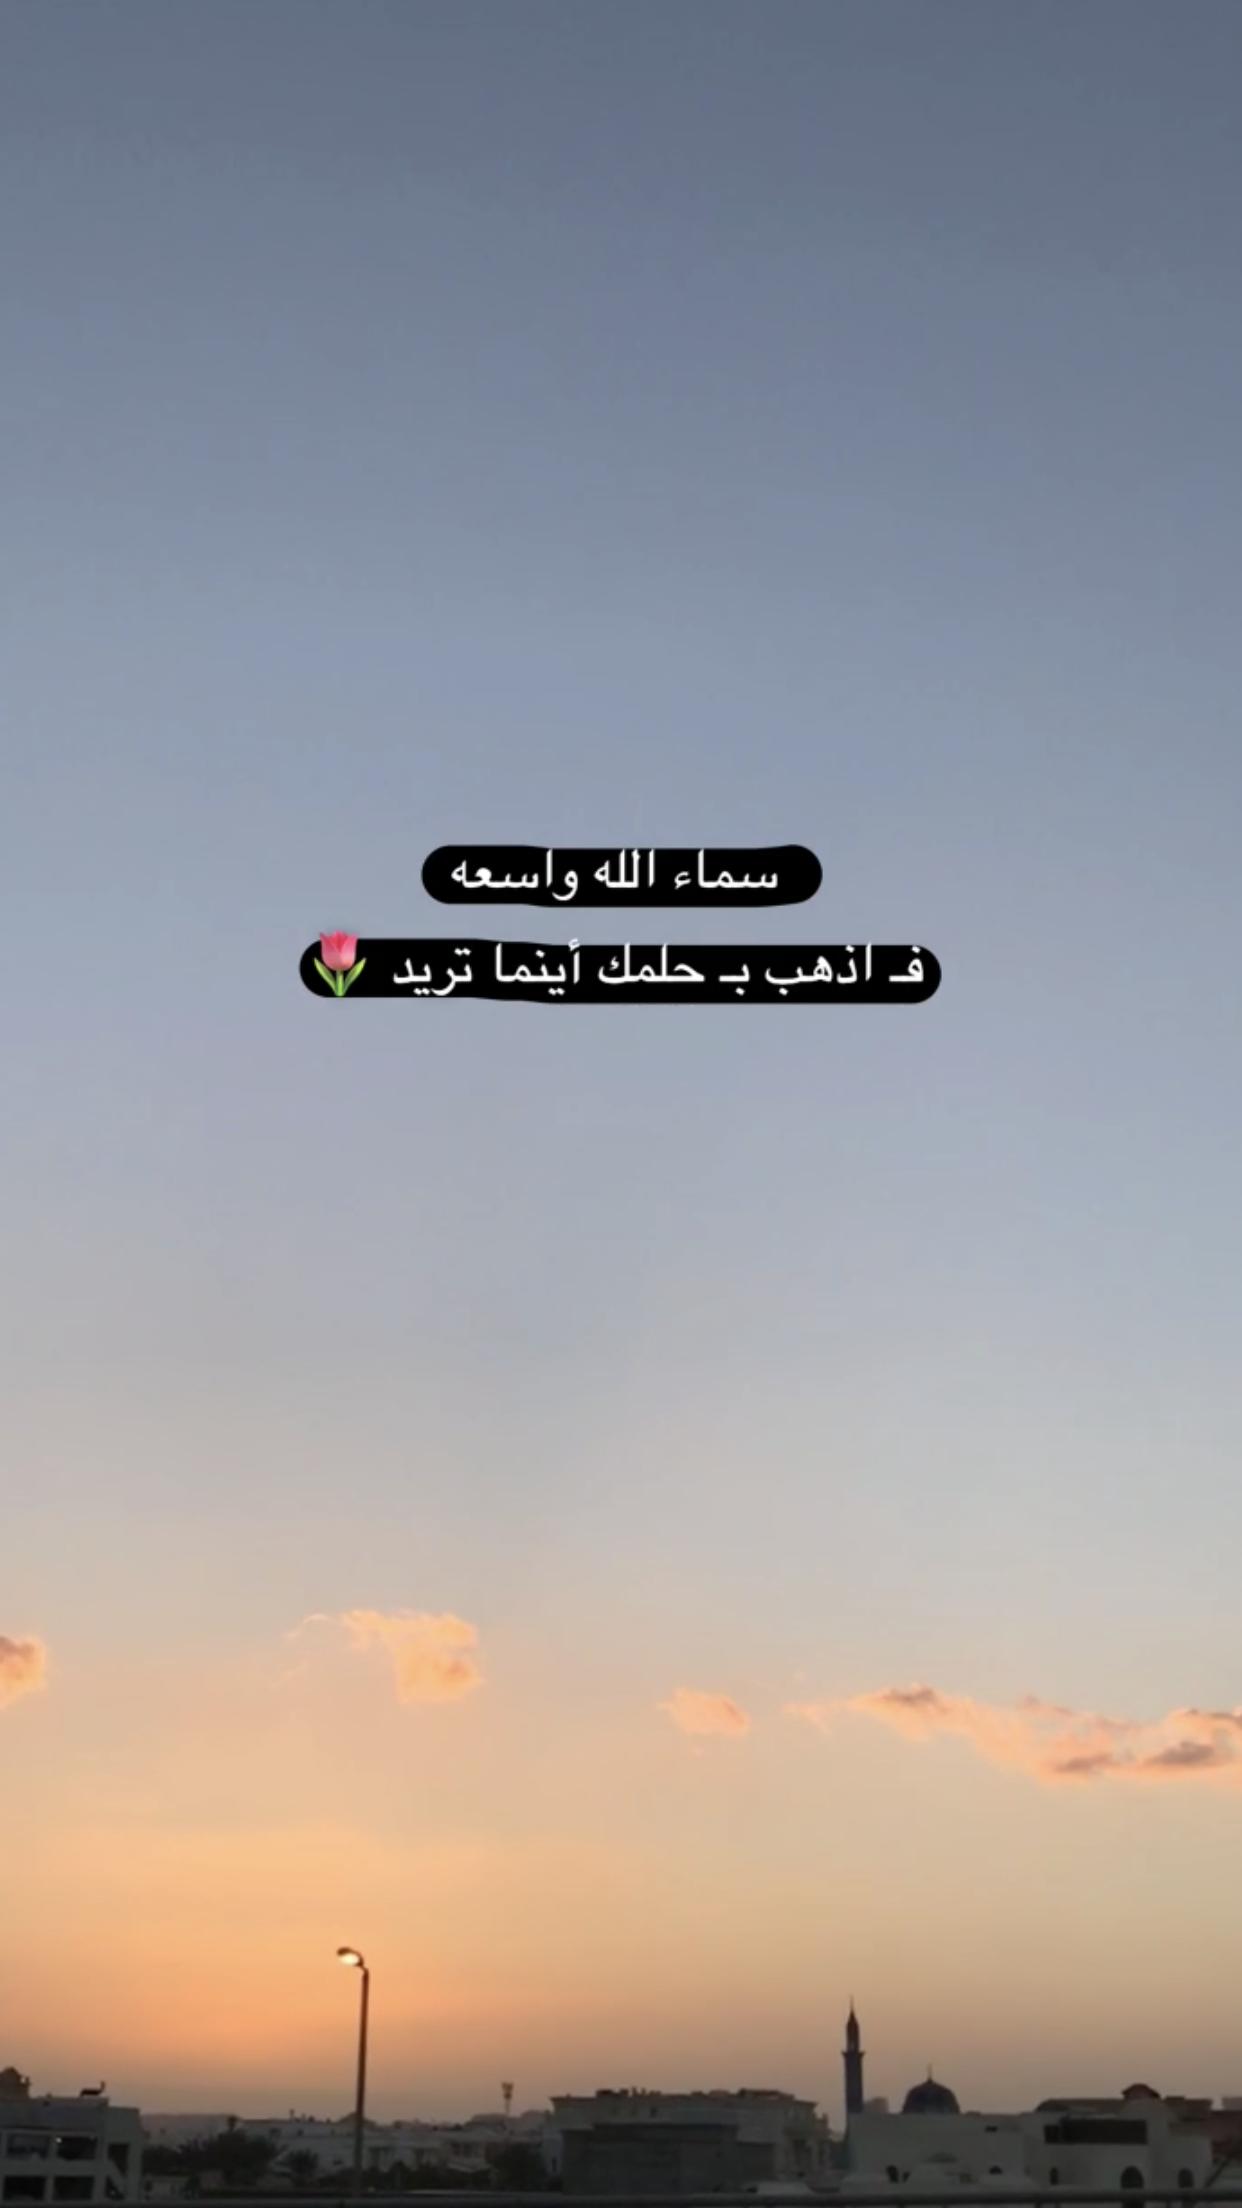 همسة سماء الله واسعه فـ اذهب بـ حلمك أينما تريد تصويري تصويري سناب تصميمي تصمي Quotes About Photography Beautiful Arabic Words Sky And Clouds